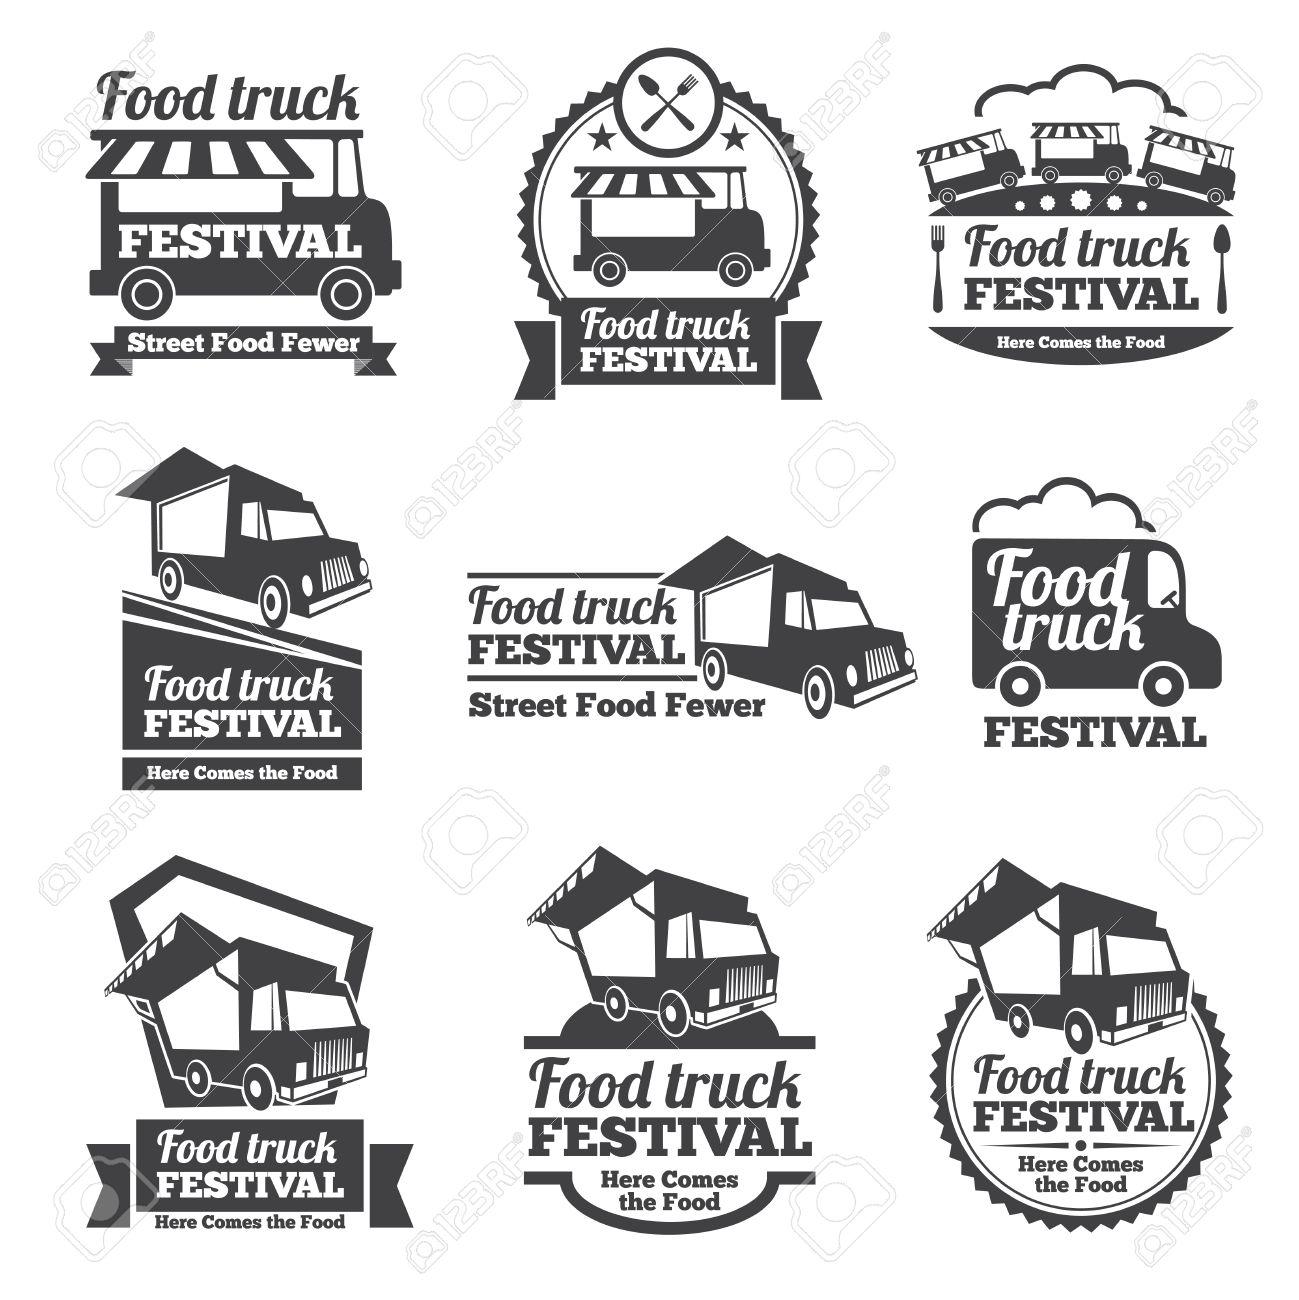 Food truck festival emblems and logos vector set. Festival street food, badge food festival, emblem food truck illustration Stock Vector - 51706993